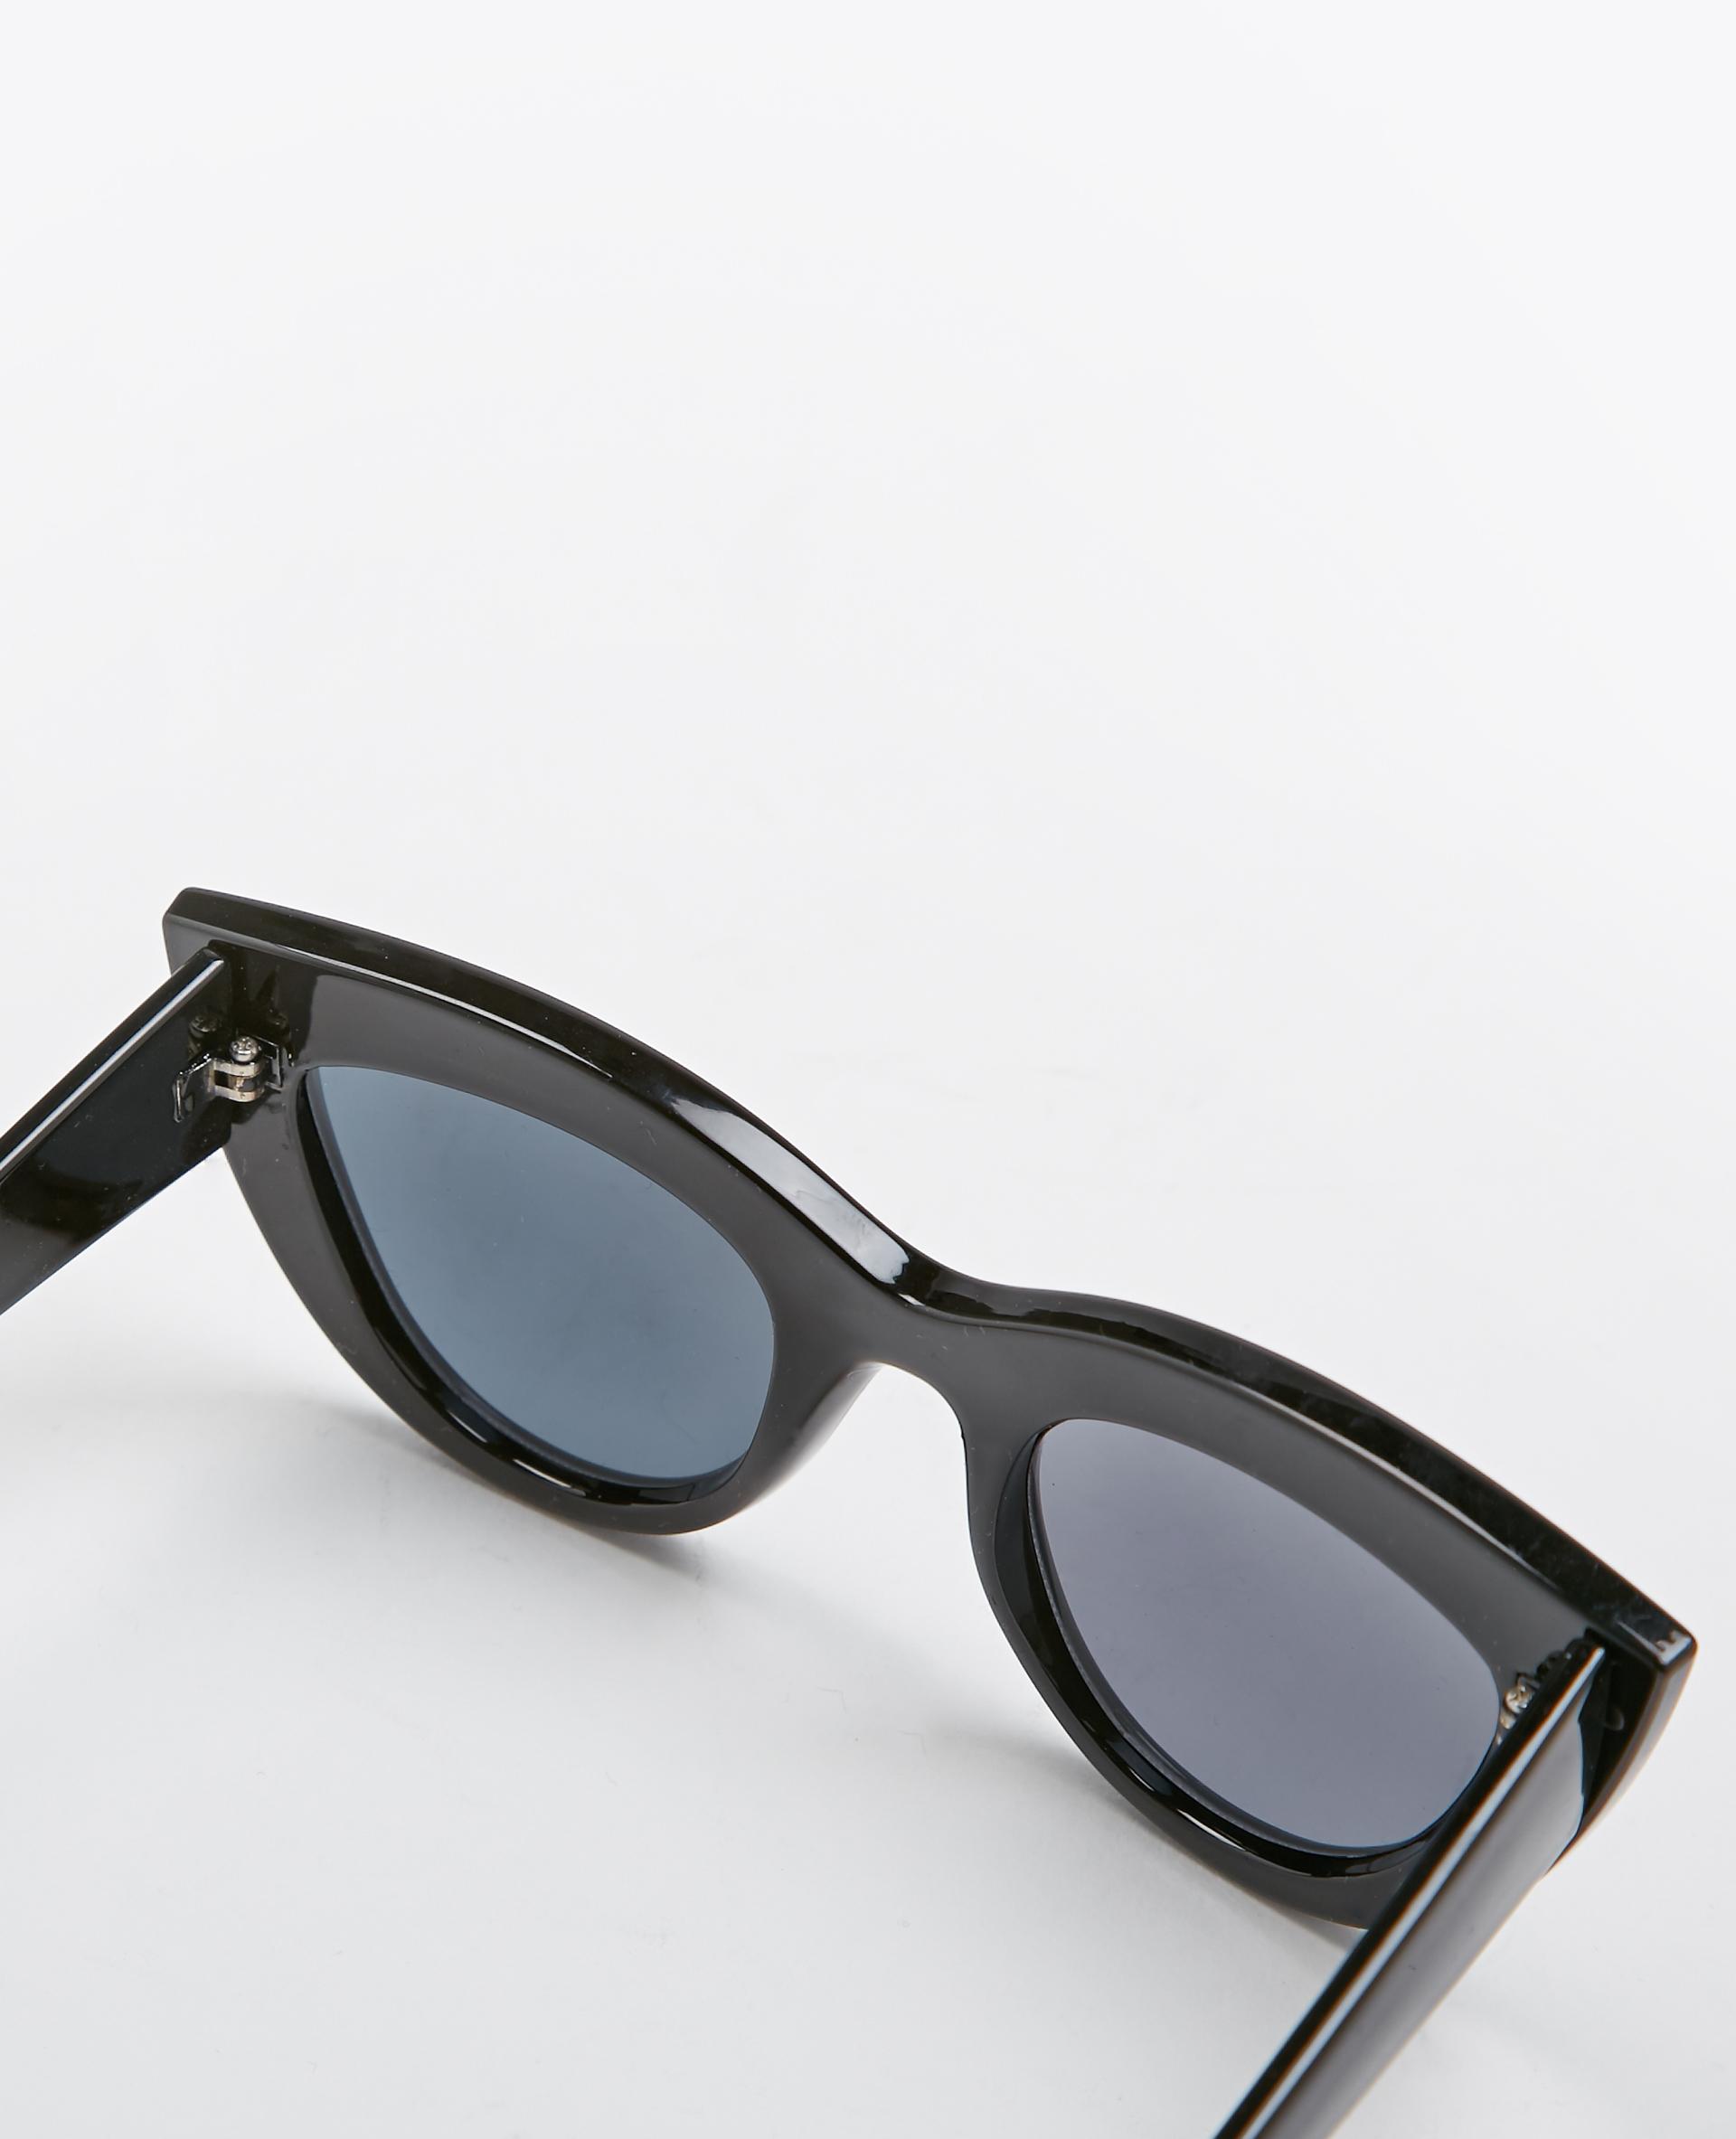 new release a few days away shop best sellers Lunettes de soleil cat eye noir - 916397899A08 | Pimkie